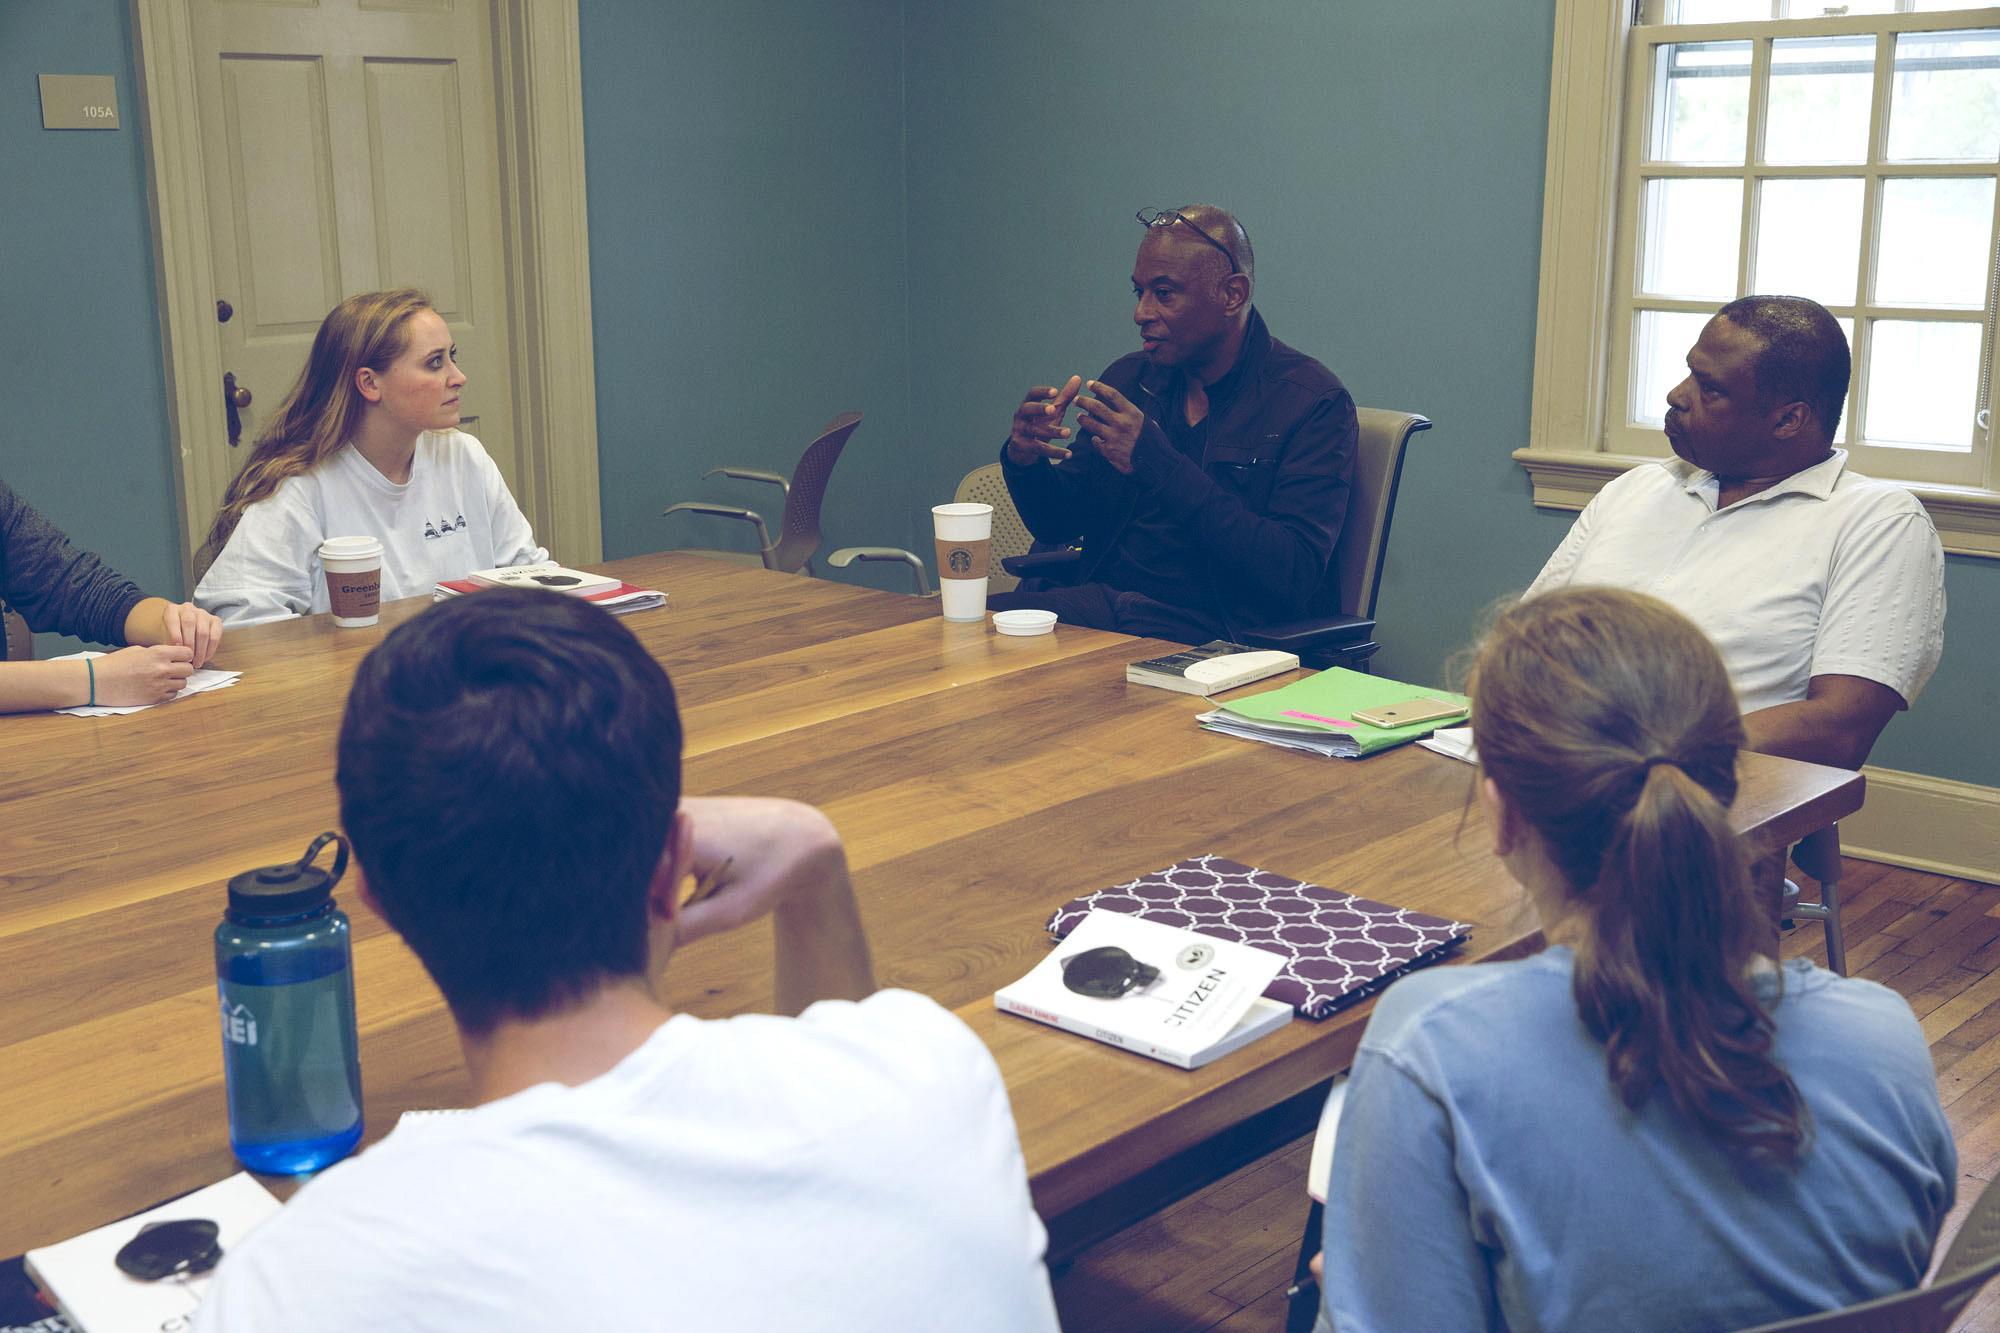 Caryl Phillips, UVA Kapnick Foundation Distinguished Writer-in-Residence, visited a graduate fiction-writing workshop last week taught by UVA professor Jeffery Allen. (Photo by Dan Addison/University Communications)